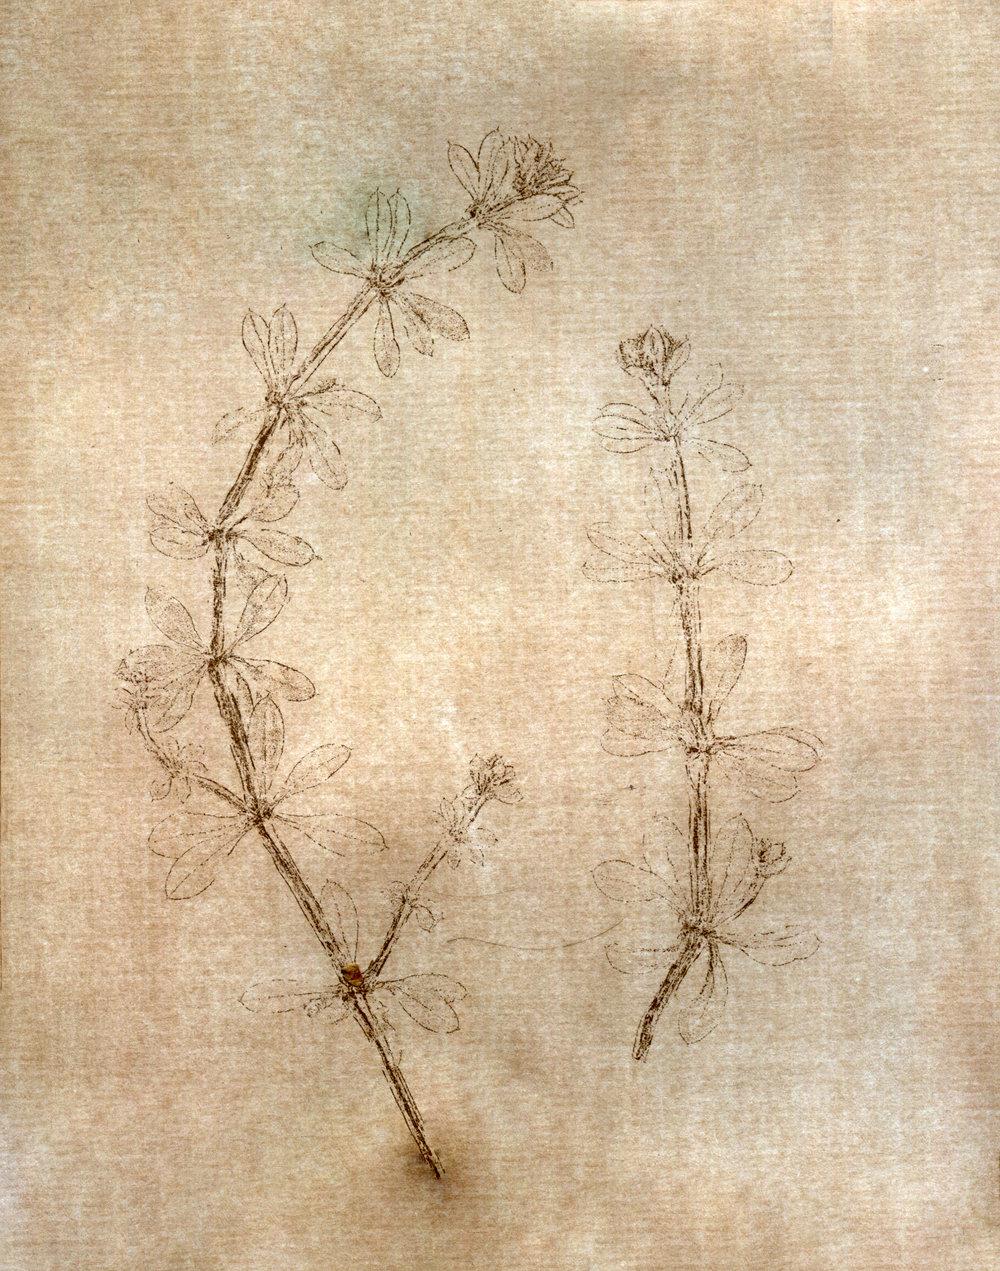 - Galium aparineBedstrawBurrsCatchweedCleaversCliversGoosegrassGreyhound asparagusGrip grassStickyweedRobin-run-the-hedgeSticky budSticky willySticky willowVelcro weed